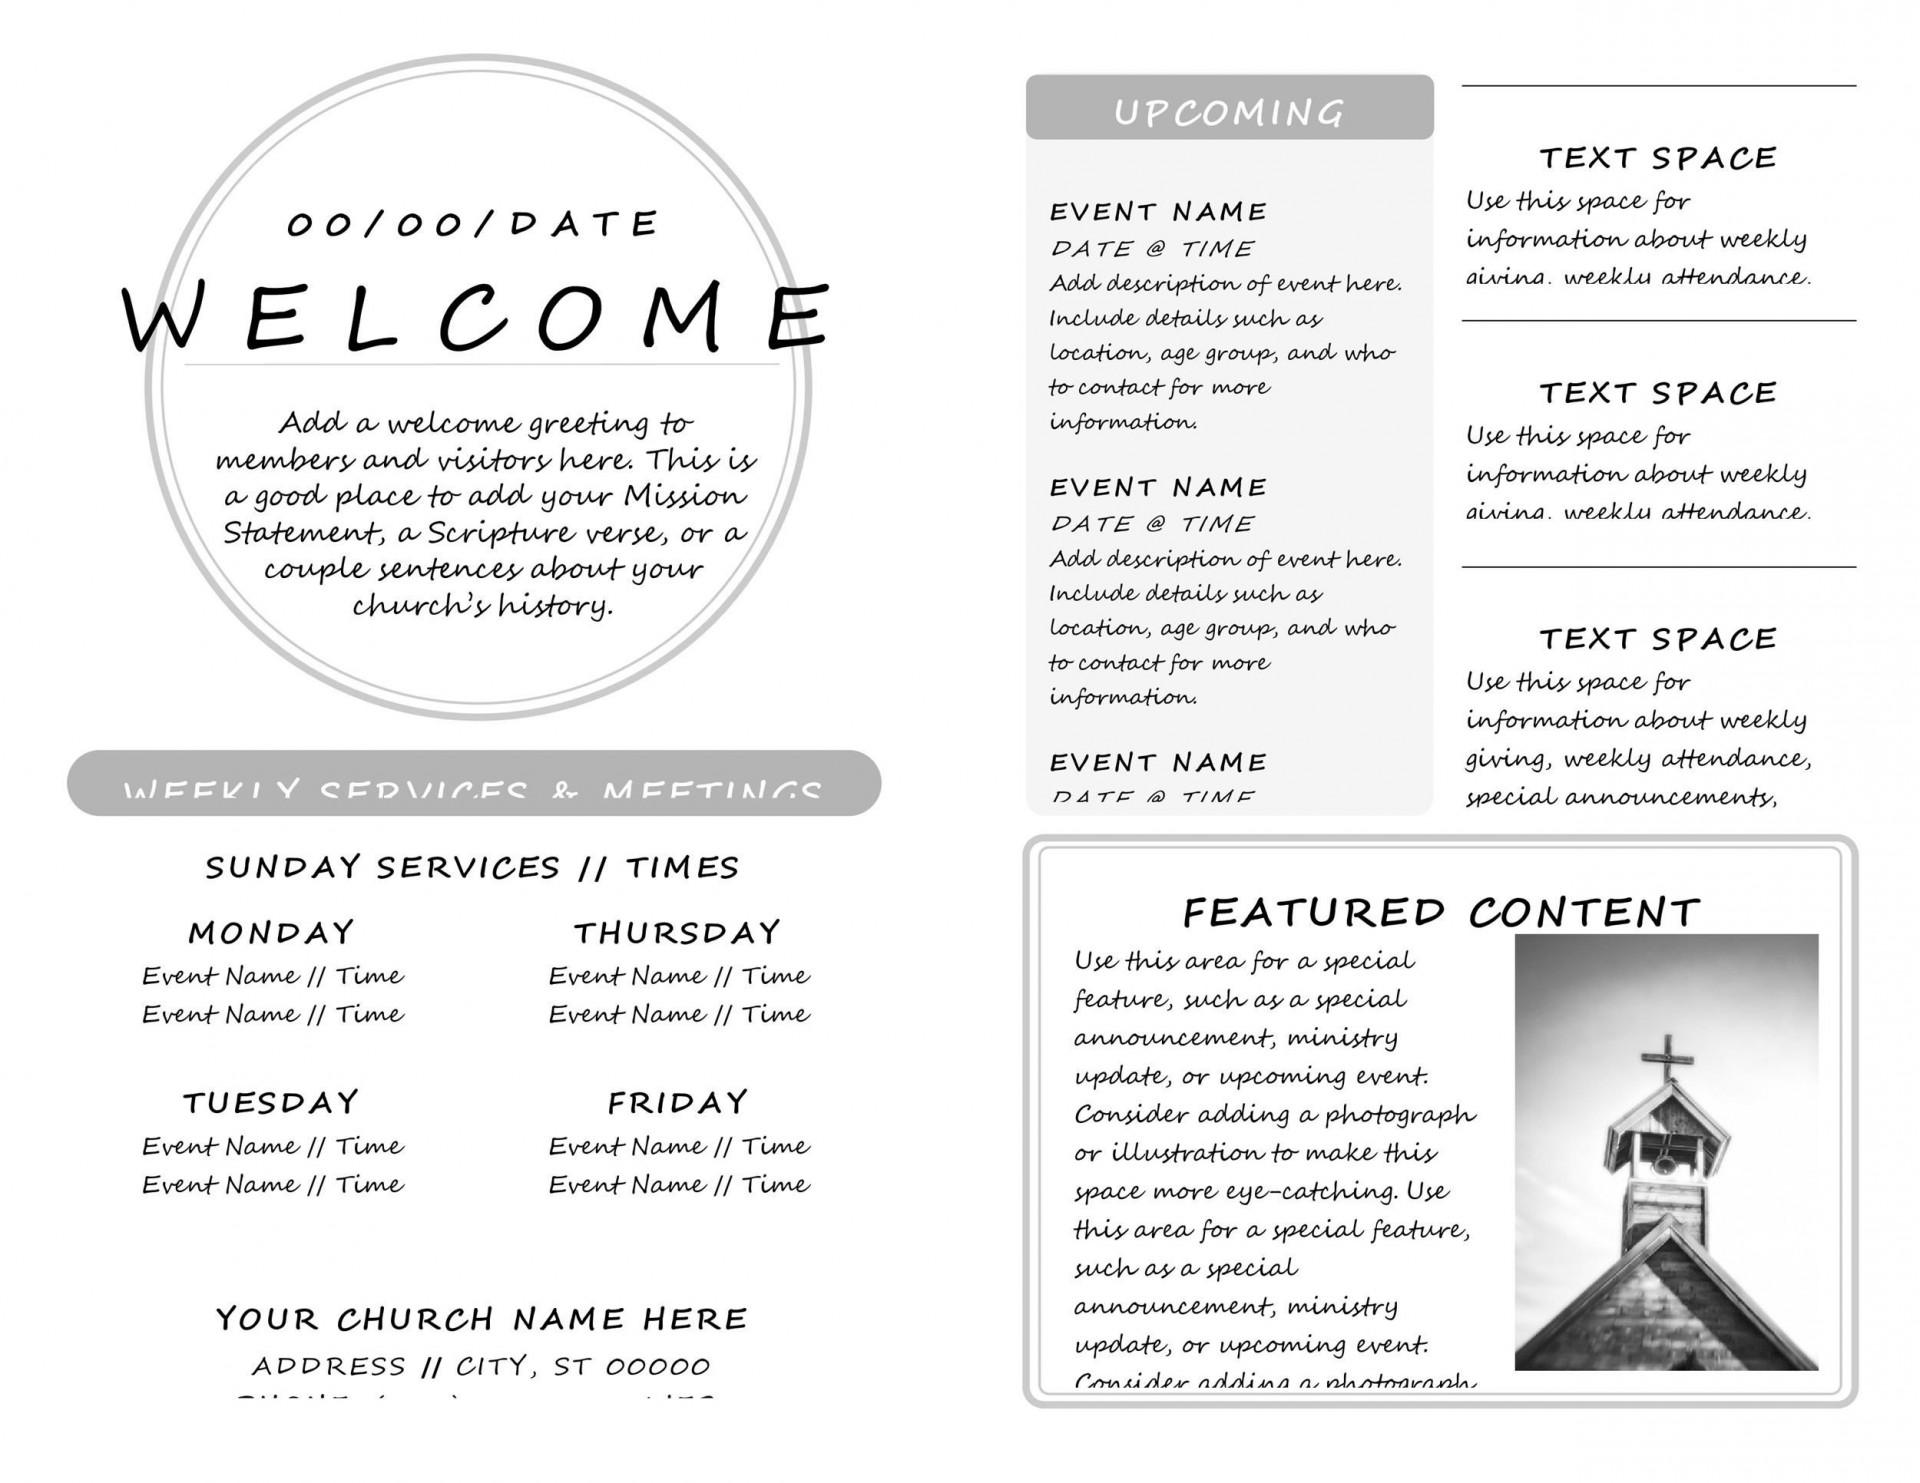 006 Amazing Free Church Program Template Download Design  Downloads1920